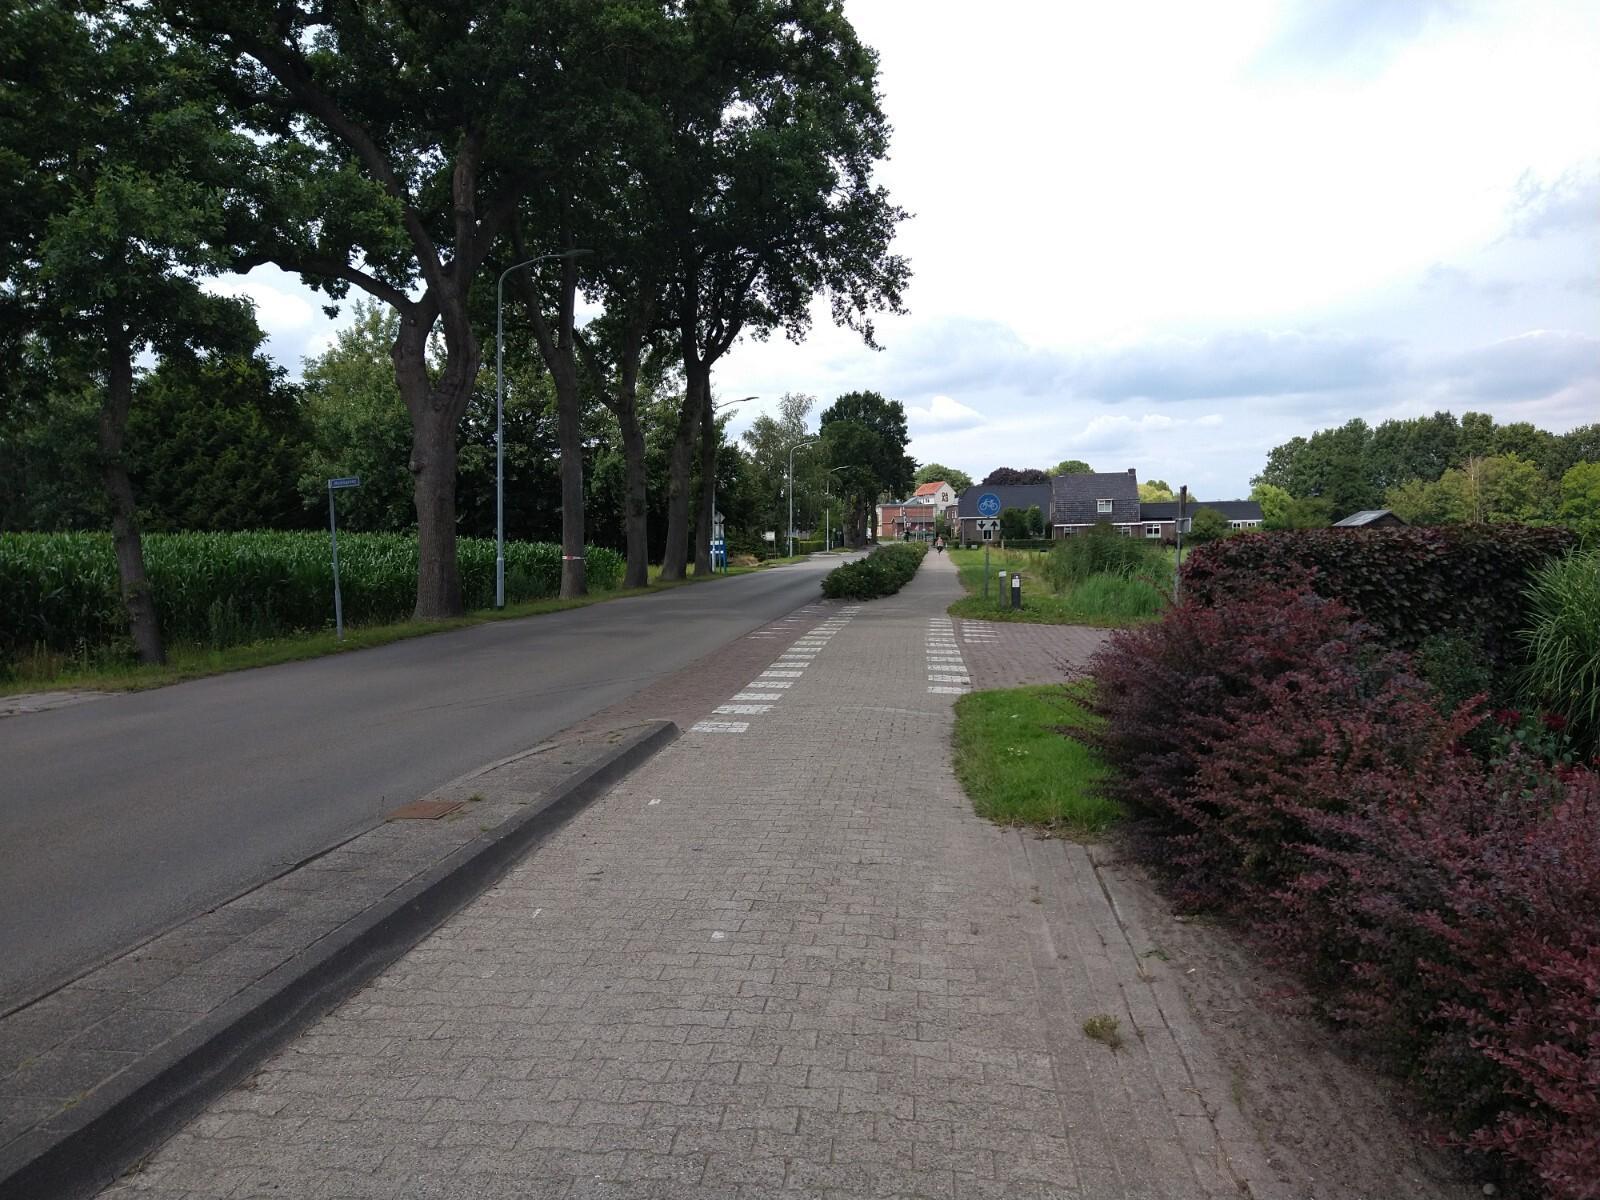 Schakelroute HLM - Stroompad